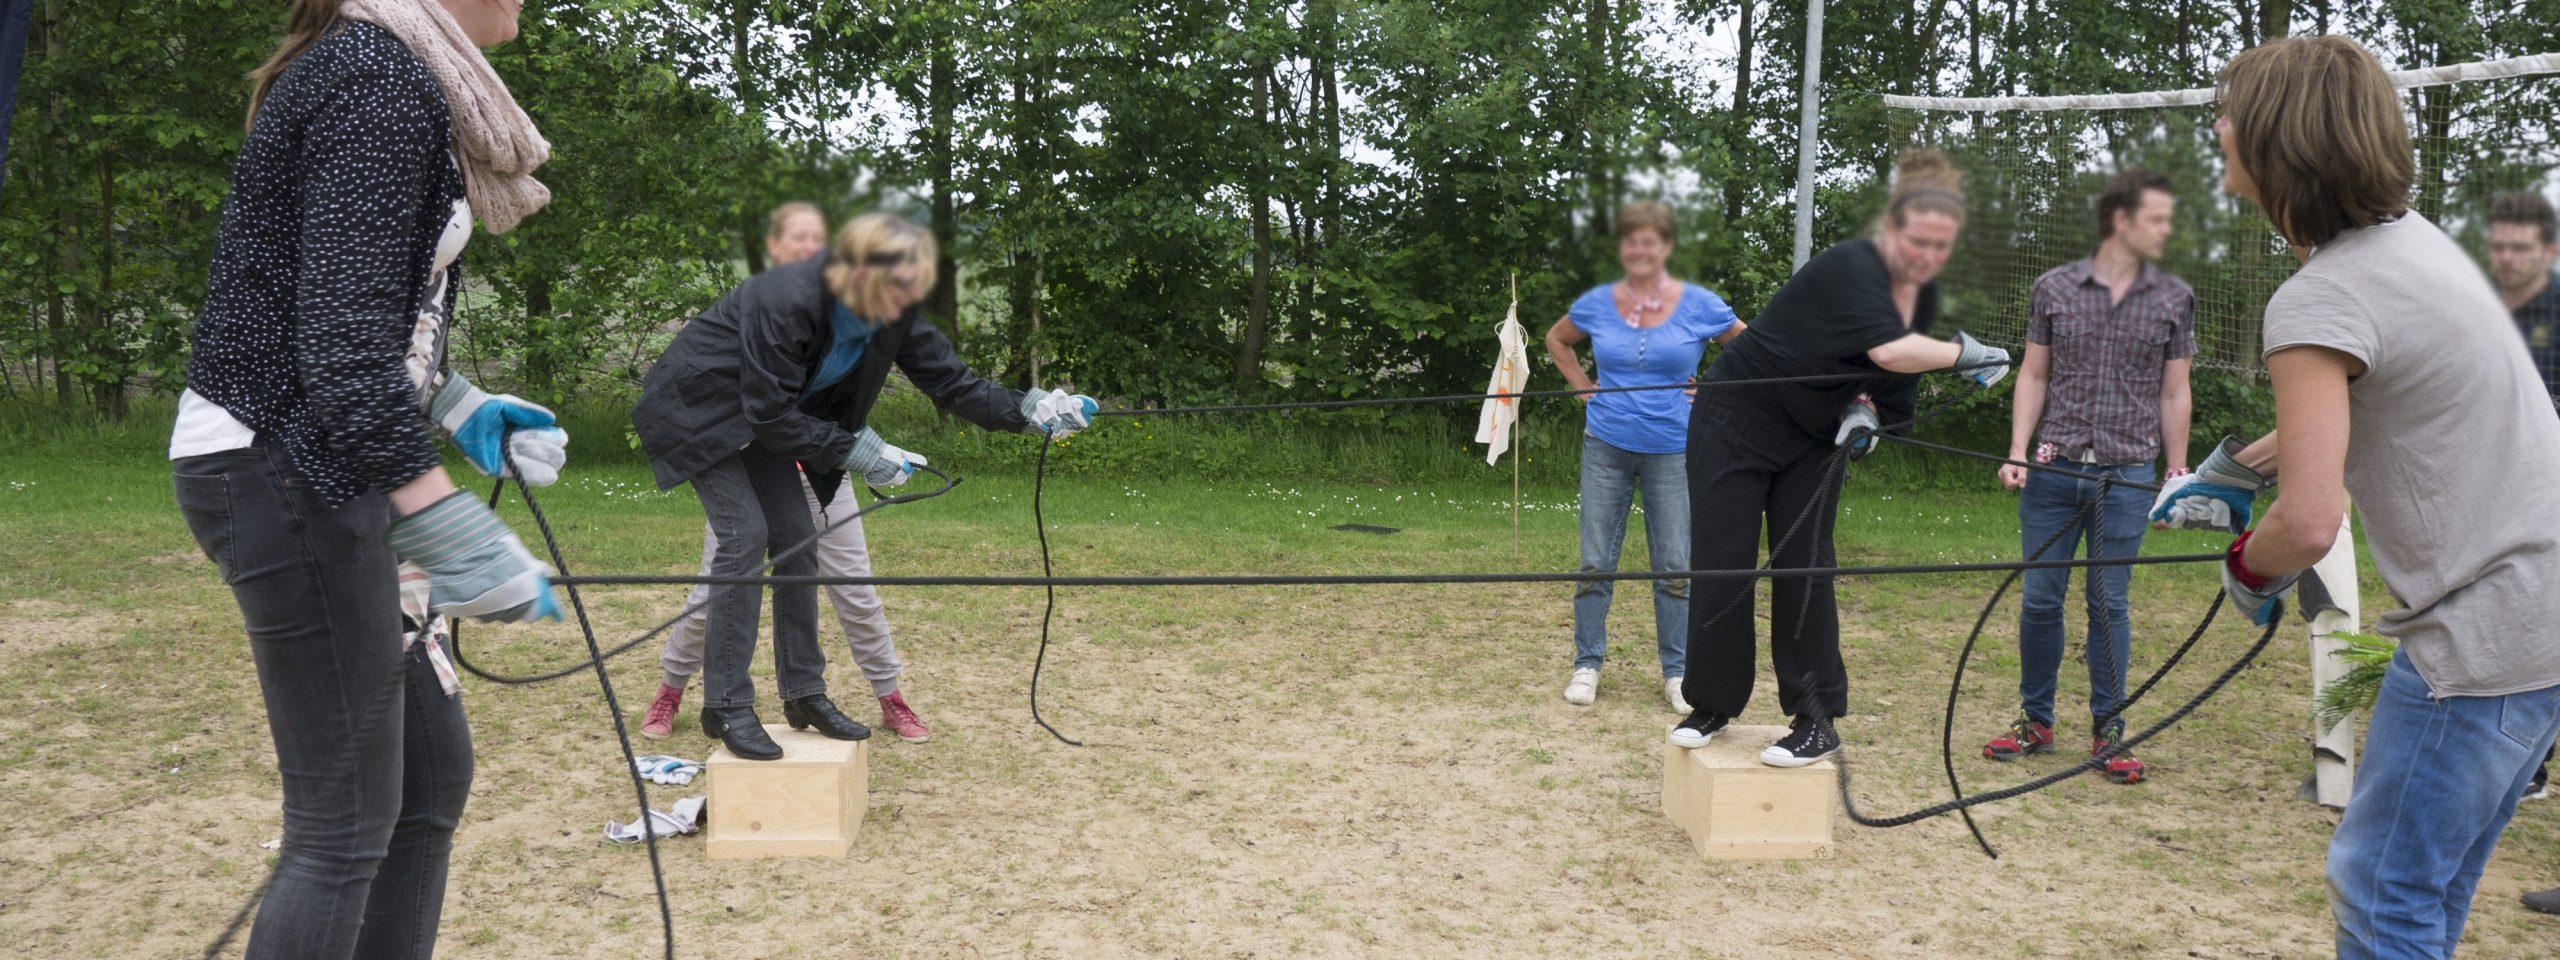 teambuilding-eindhoven